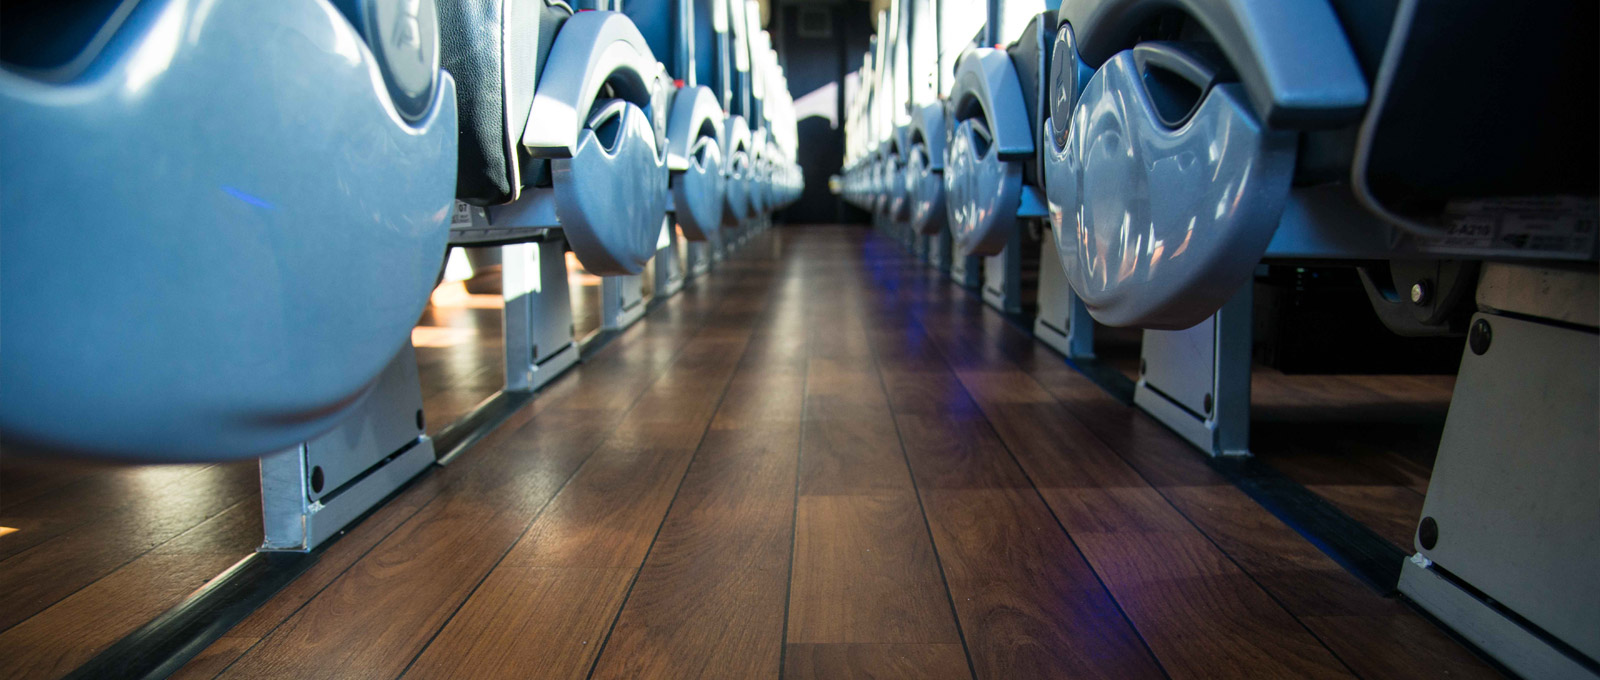 interior coach floor